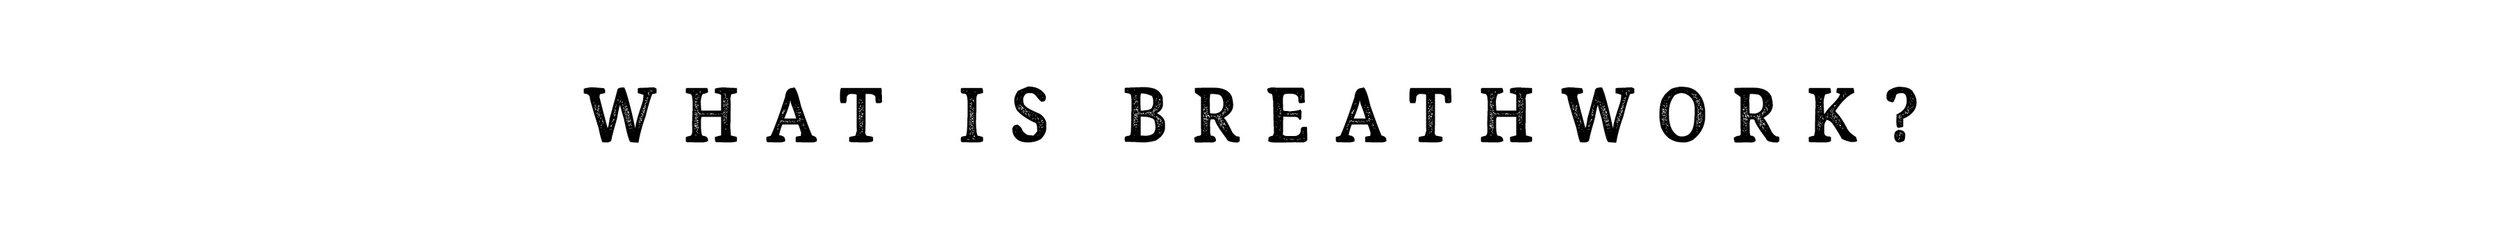 SS_What is Breathwork.jpg